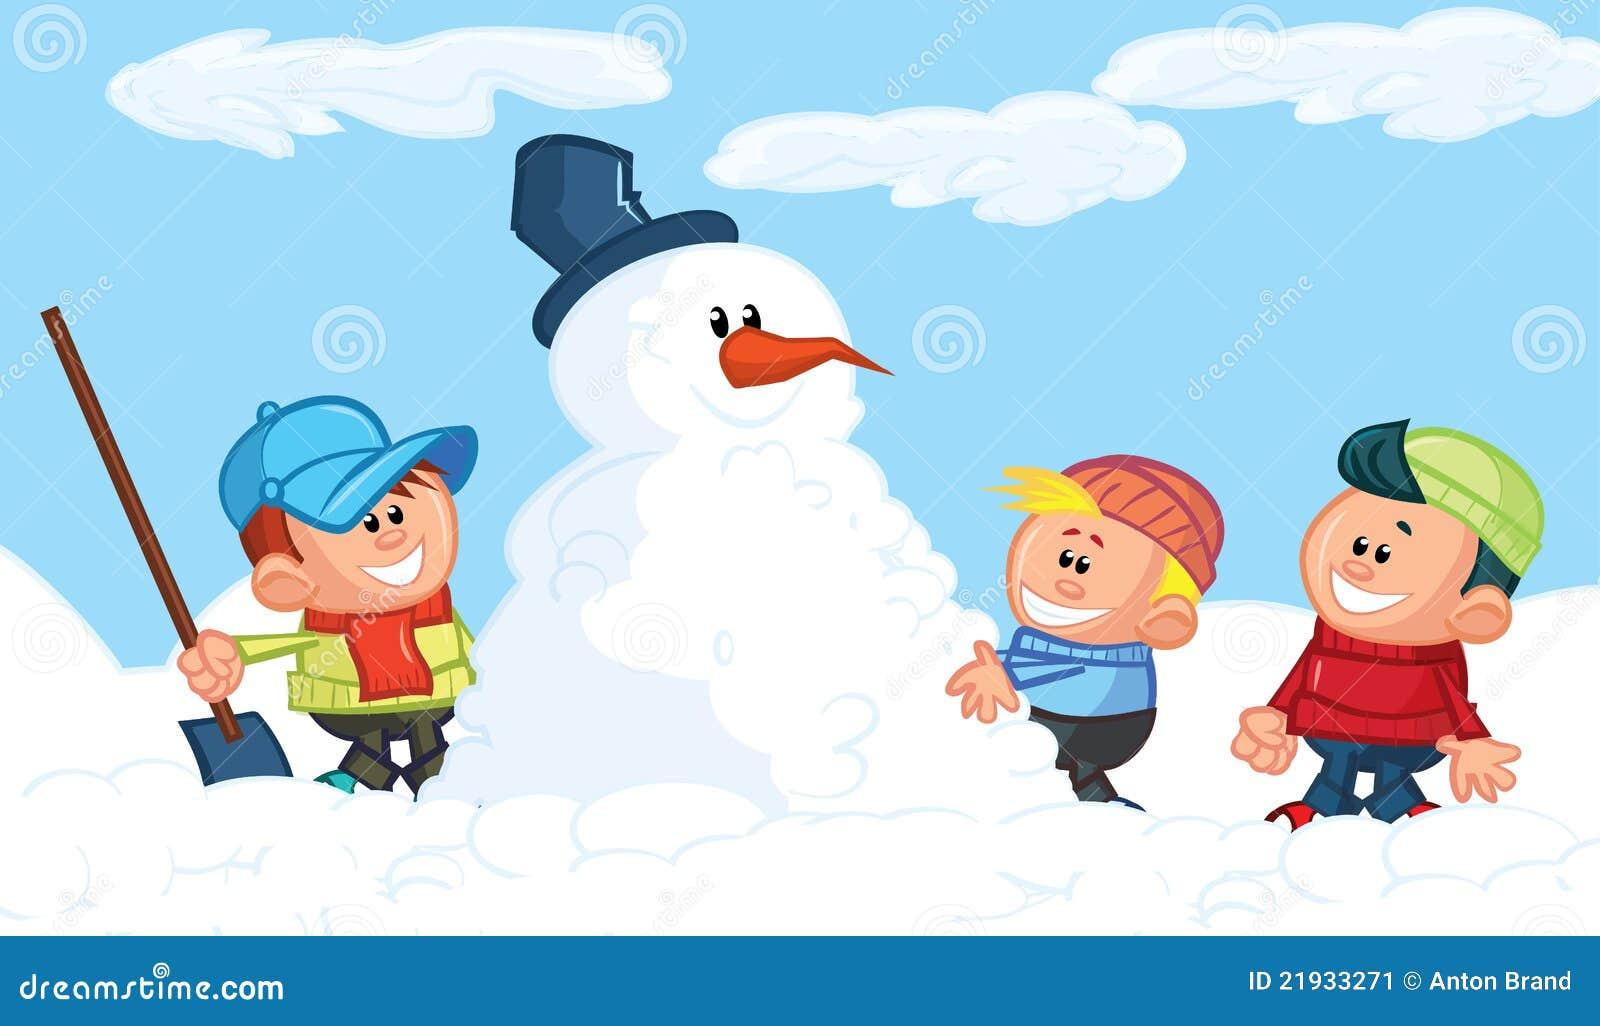 Cute Snowman Clip Art Set – Daily Art Hub – Free Clip Art Everyday